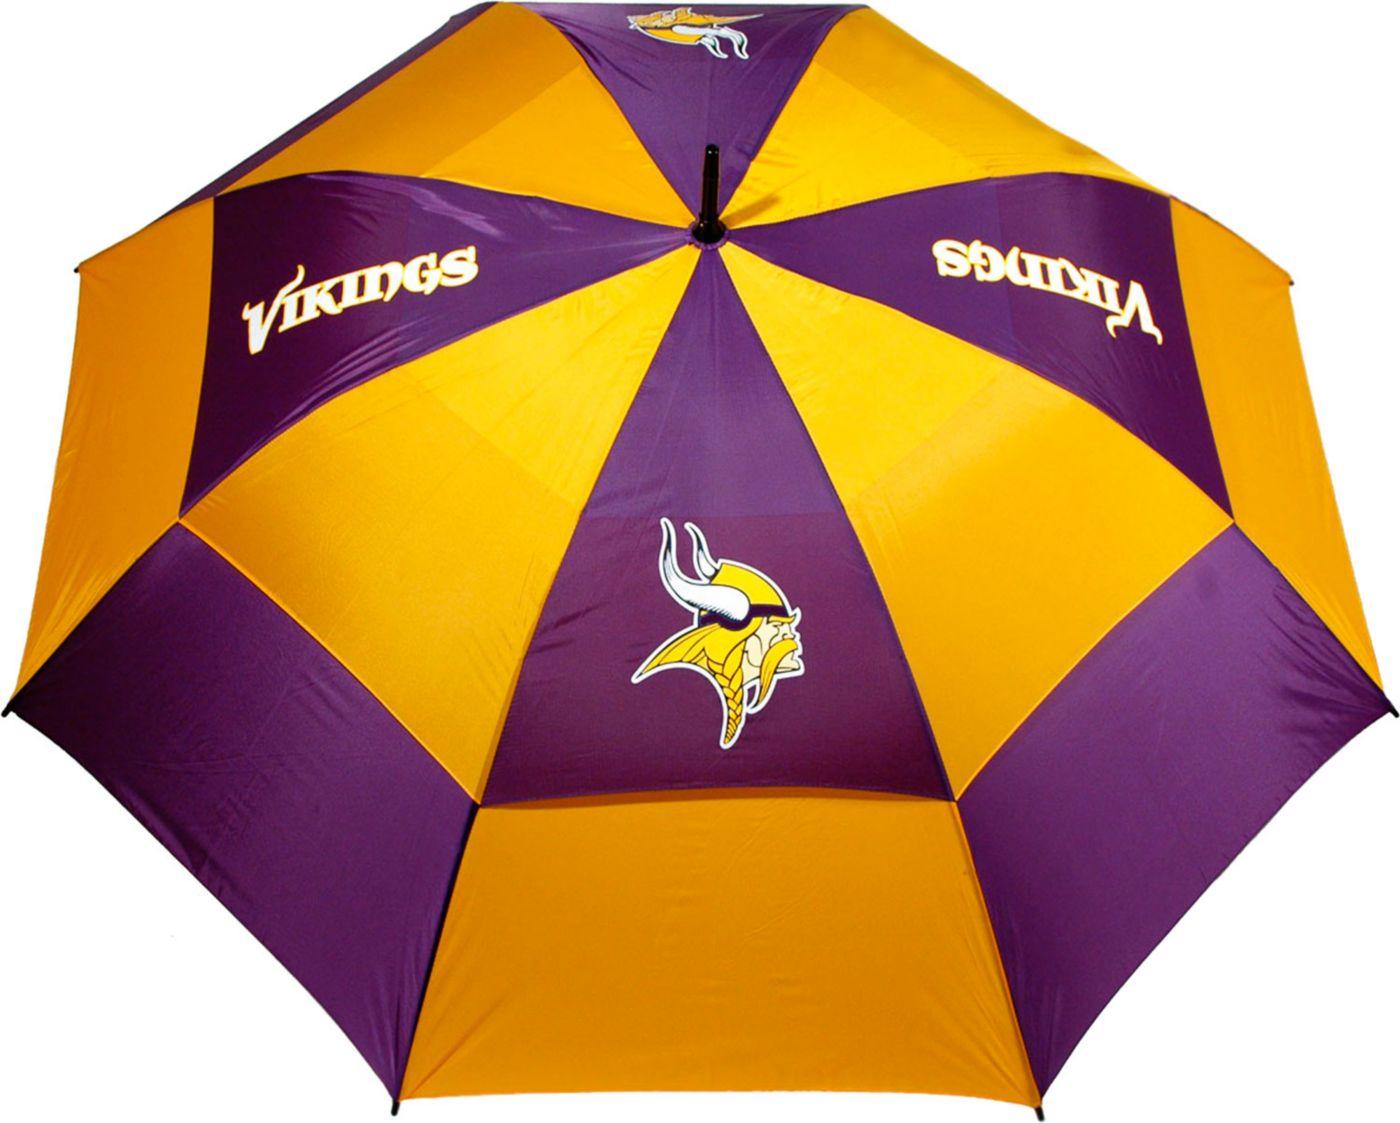 "Team Golf Minnesota Vikings 62"" Double Canopy Umbrella"